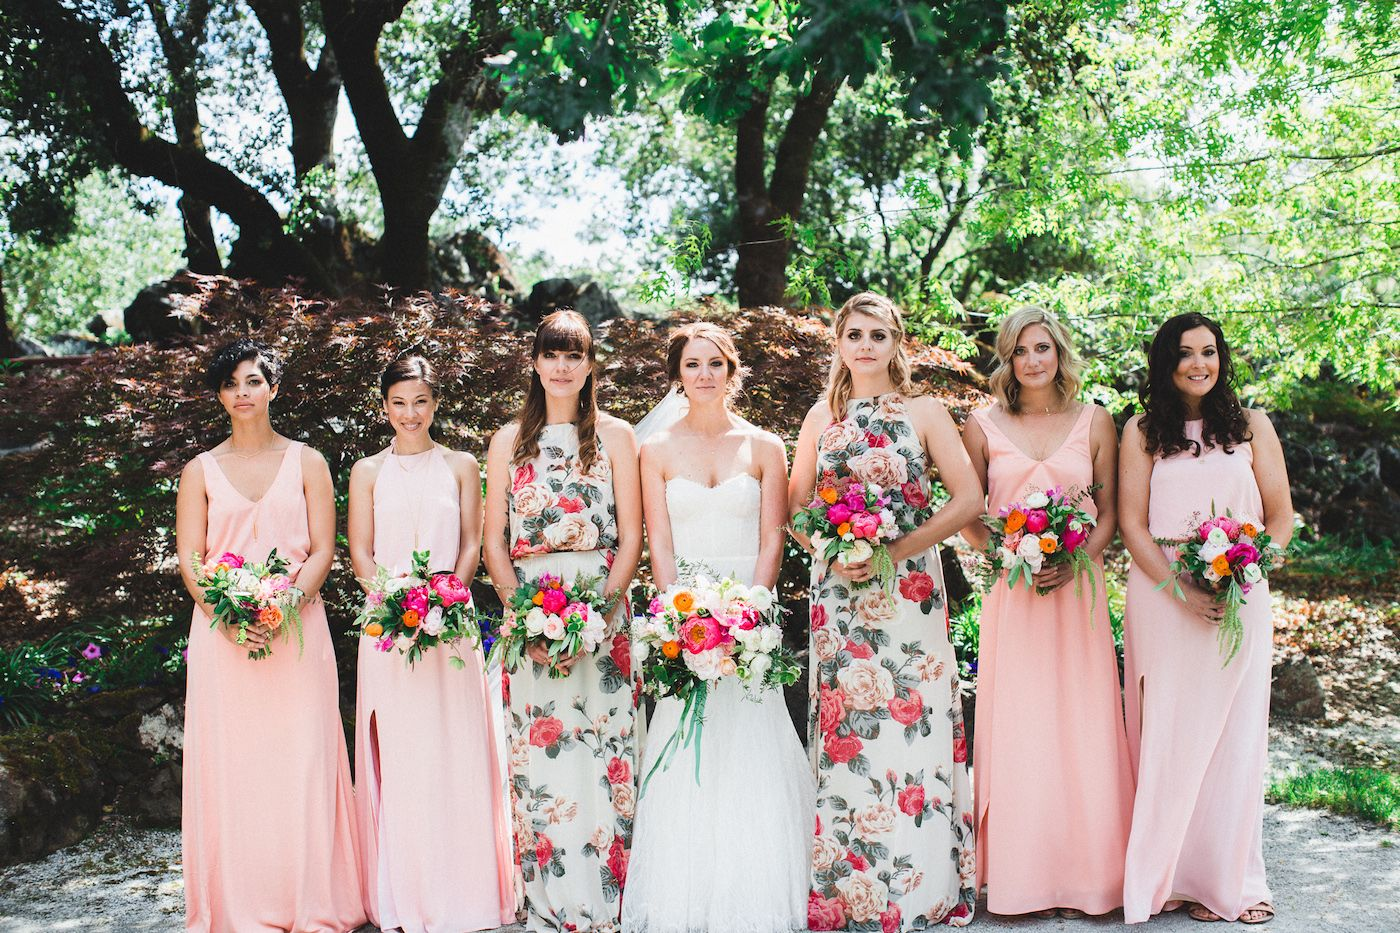 Vibrant winery wedding in california floral bridesmaid dresses floral bridesmaid dresses photo by studio castillero httpruffledblog ombrellifo Image collections